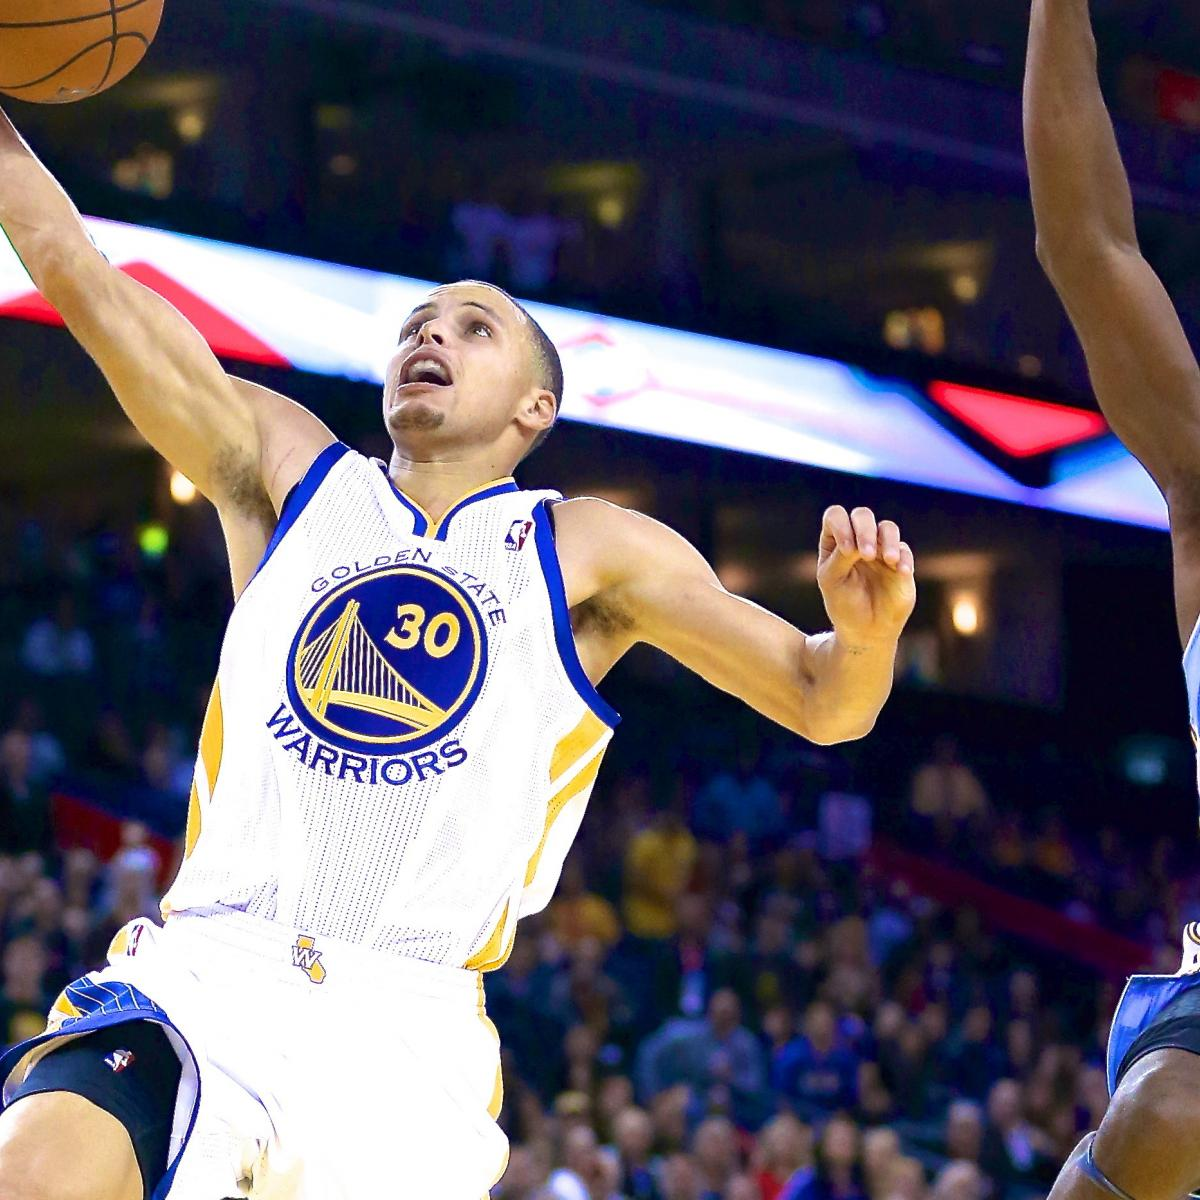 Denver Nuggets Score: Denver Nuggets Vs. G.S. Warriors: Game 3 Live Score